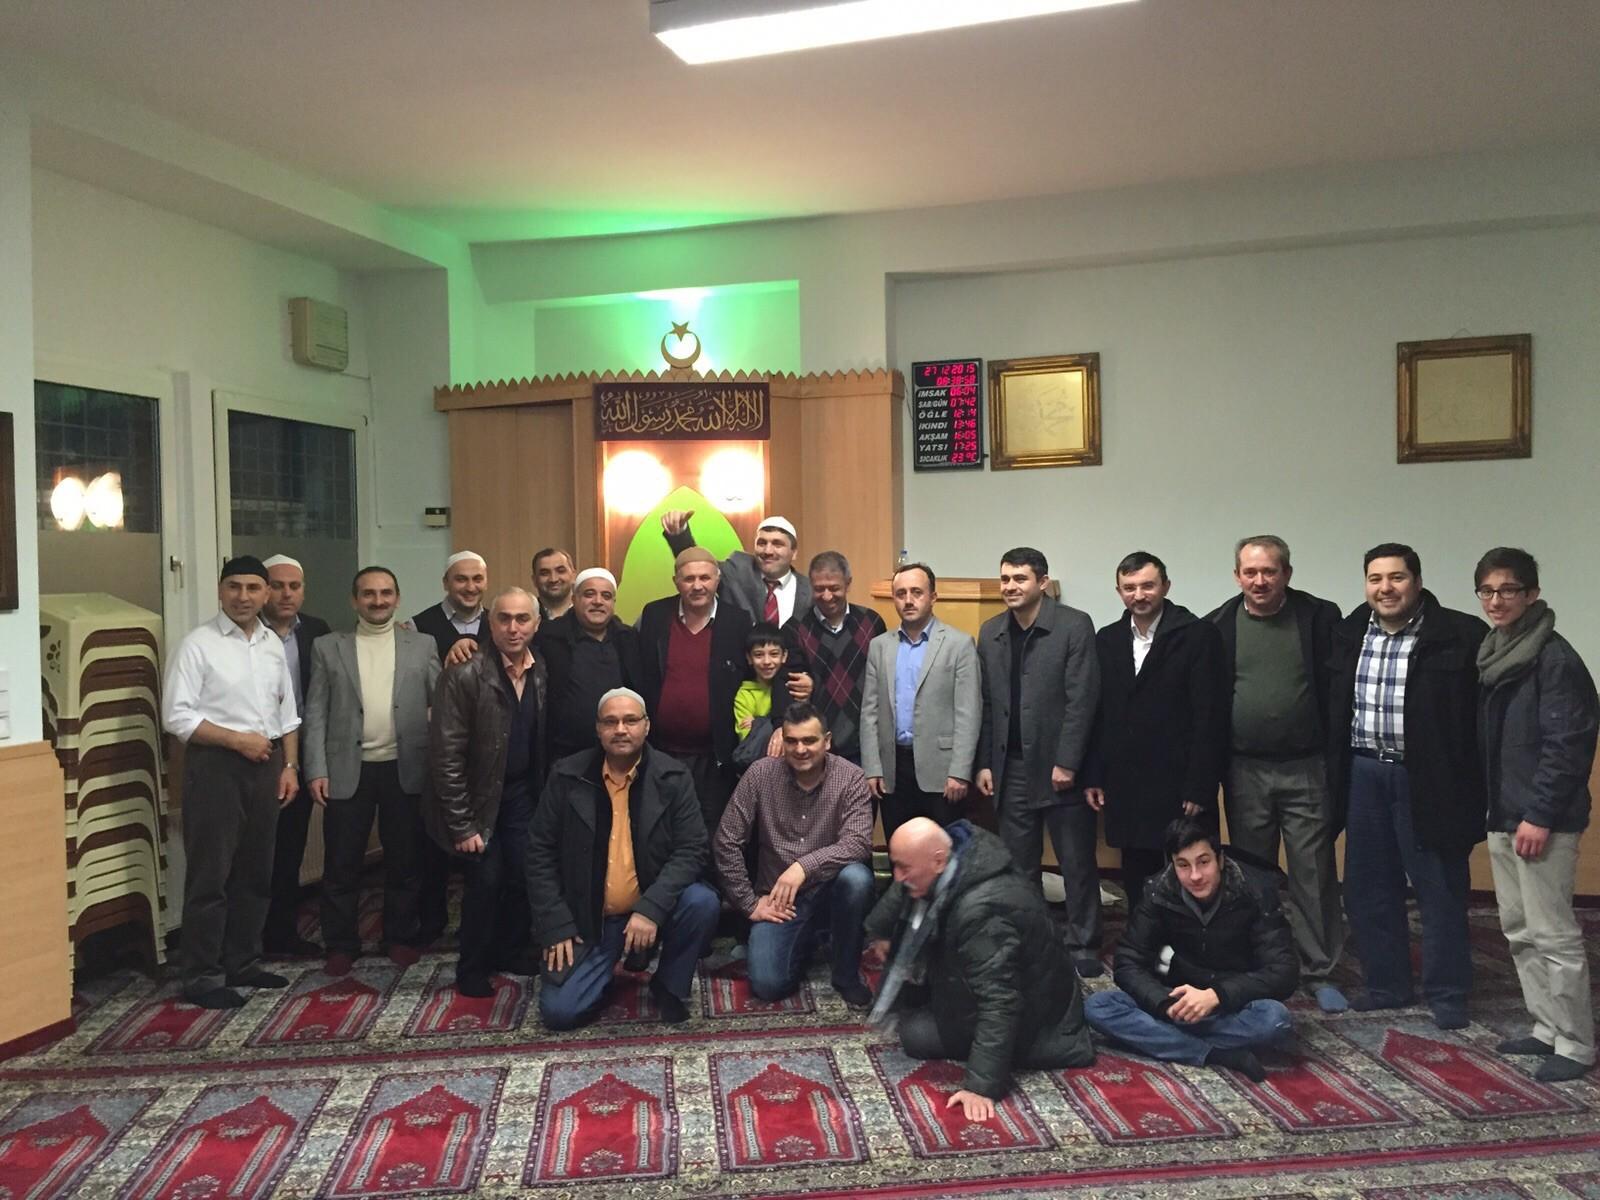 Ditib Muradiye Camii  27.12.2015